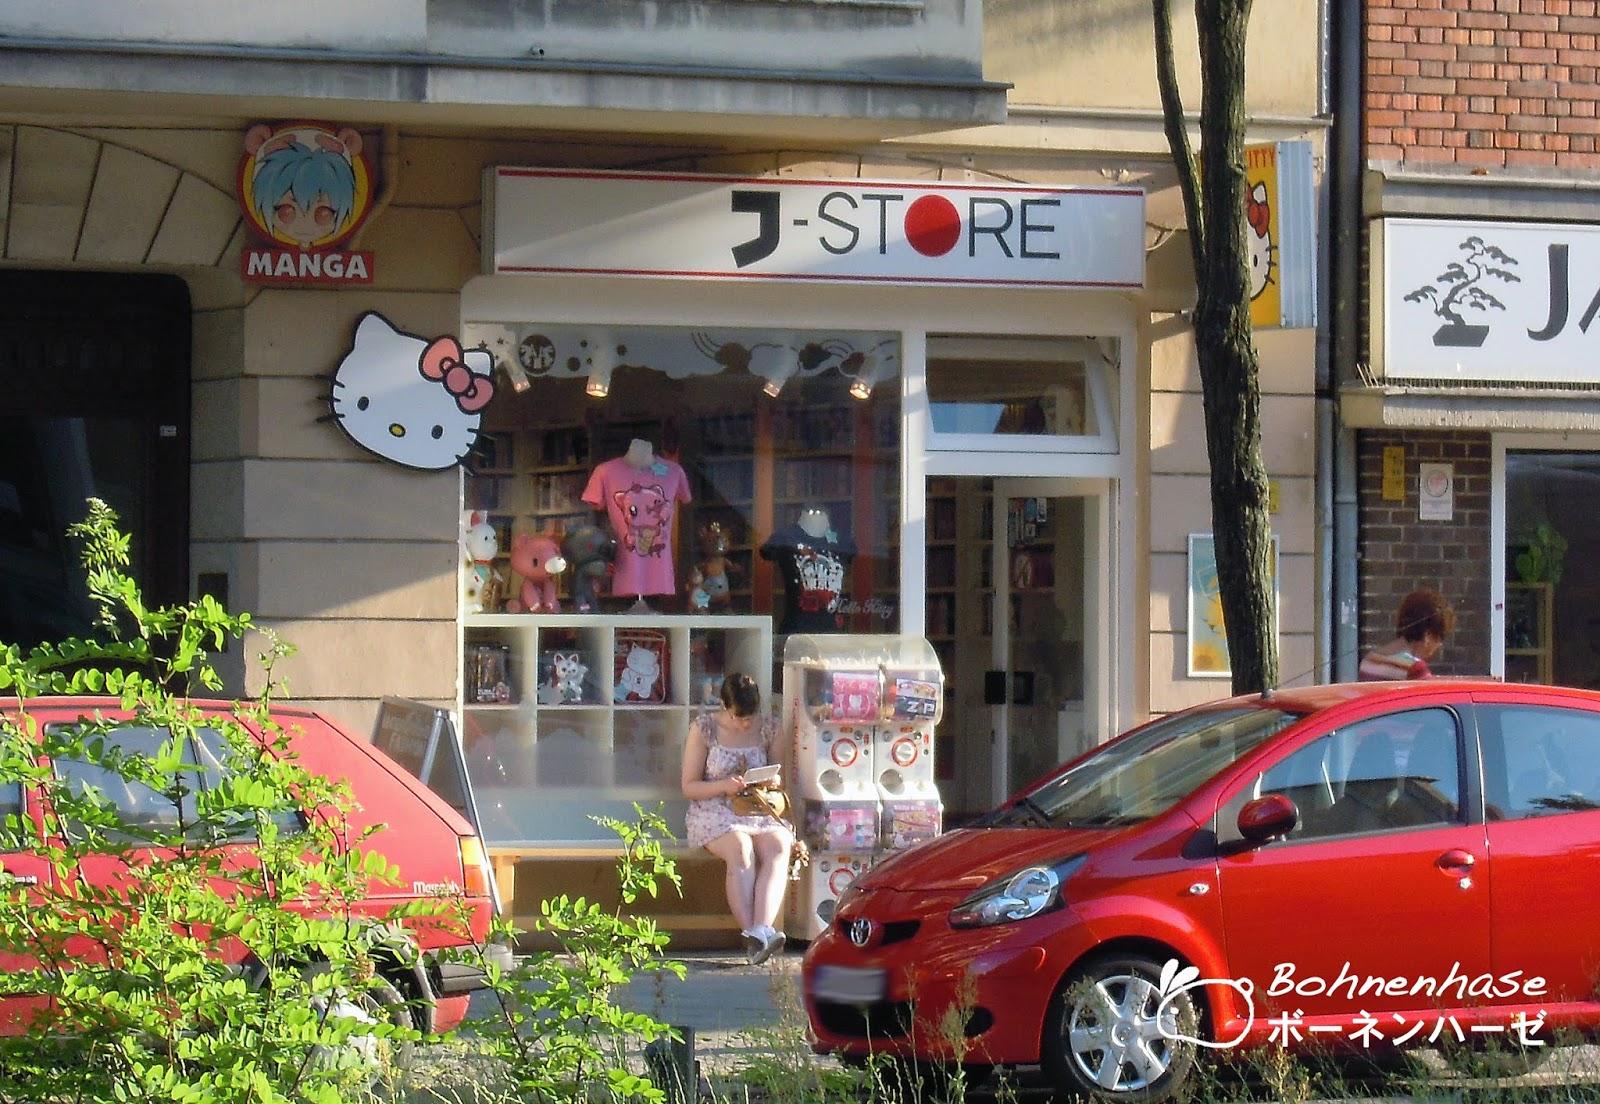 bohnenhase bento j store in berlin charlottenburg. Black Bedroom Furniture Sets. Home Design Ideas